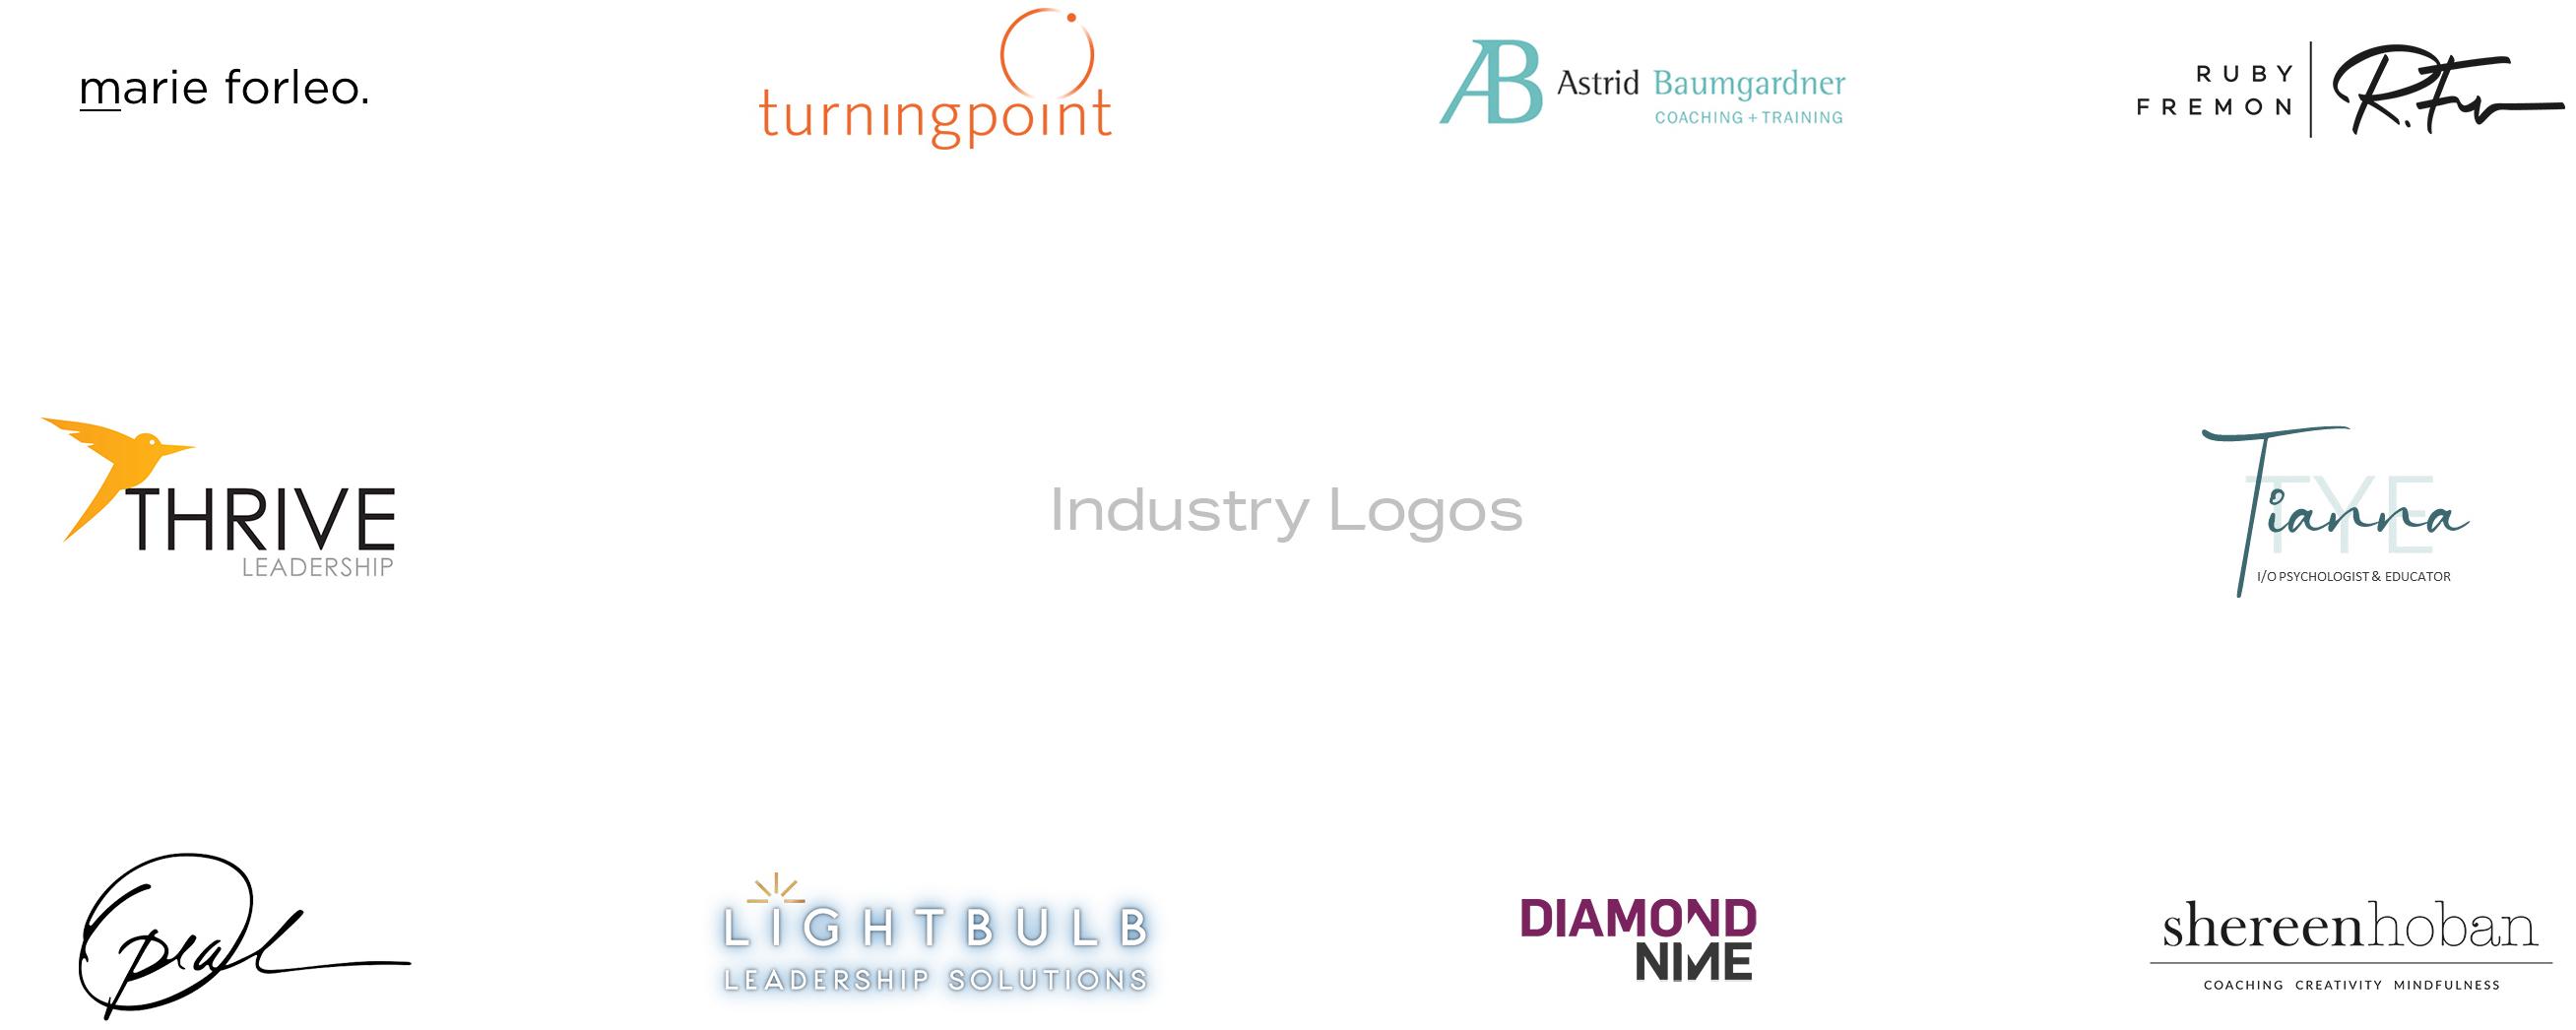 Leadership coaching industry logos